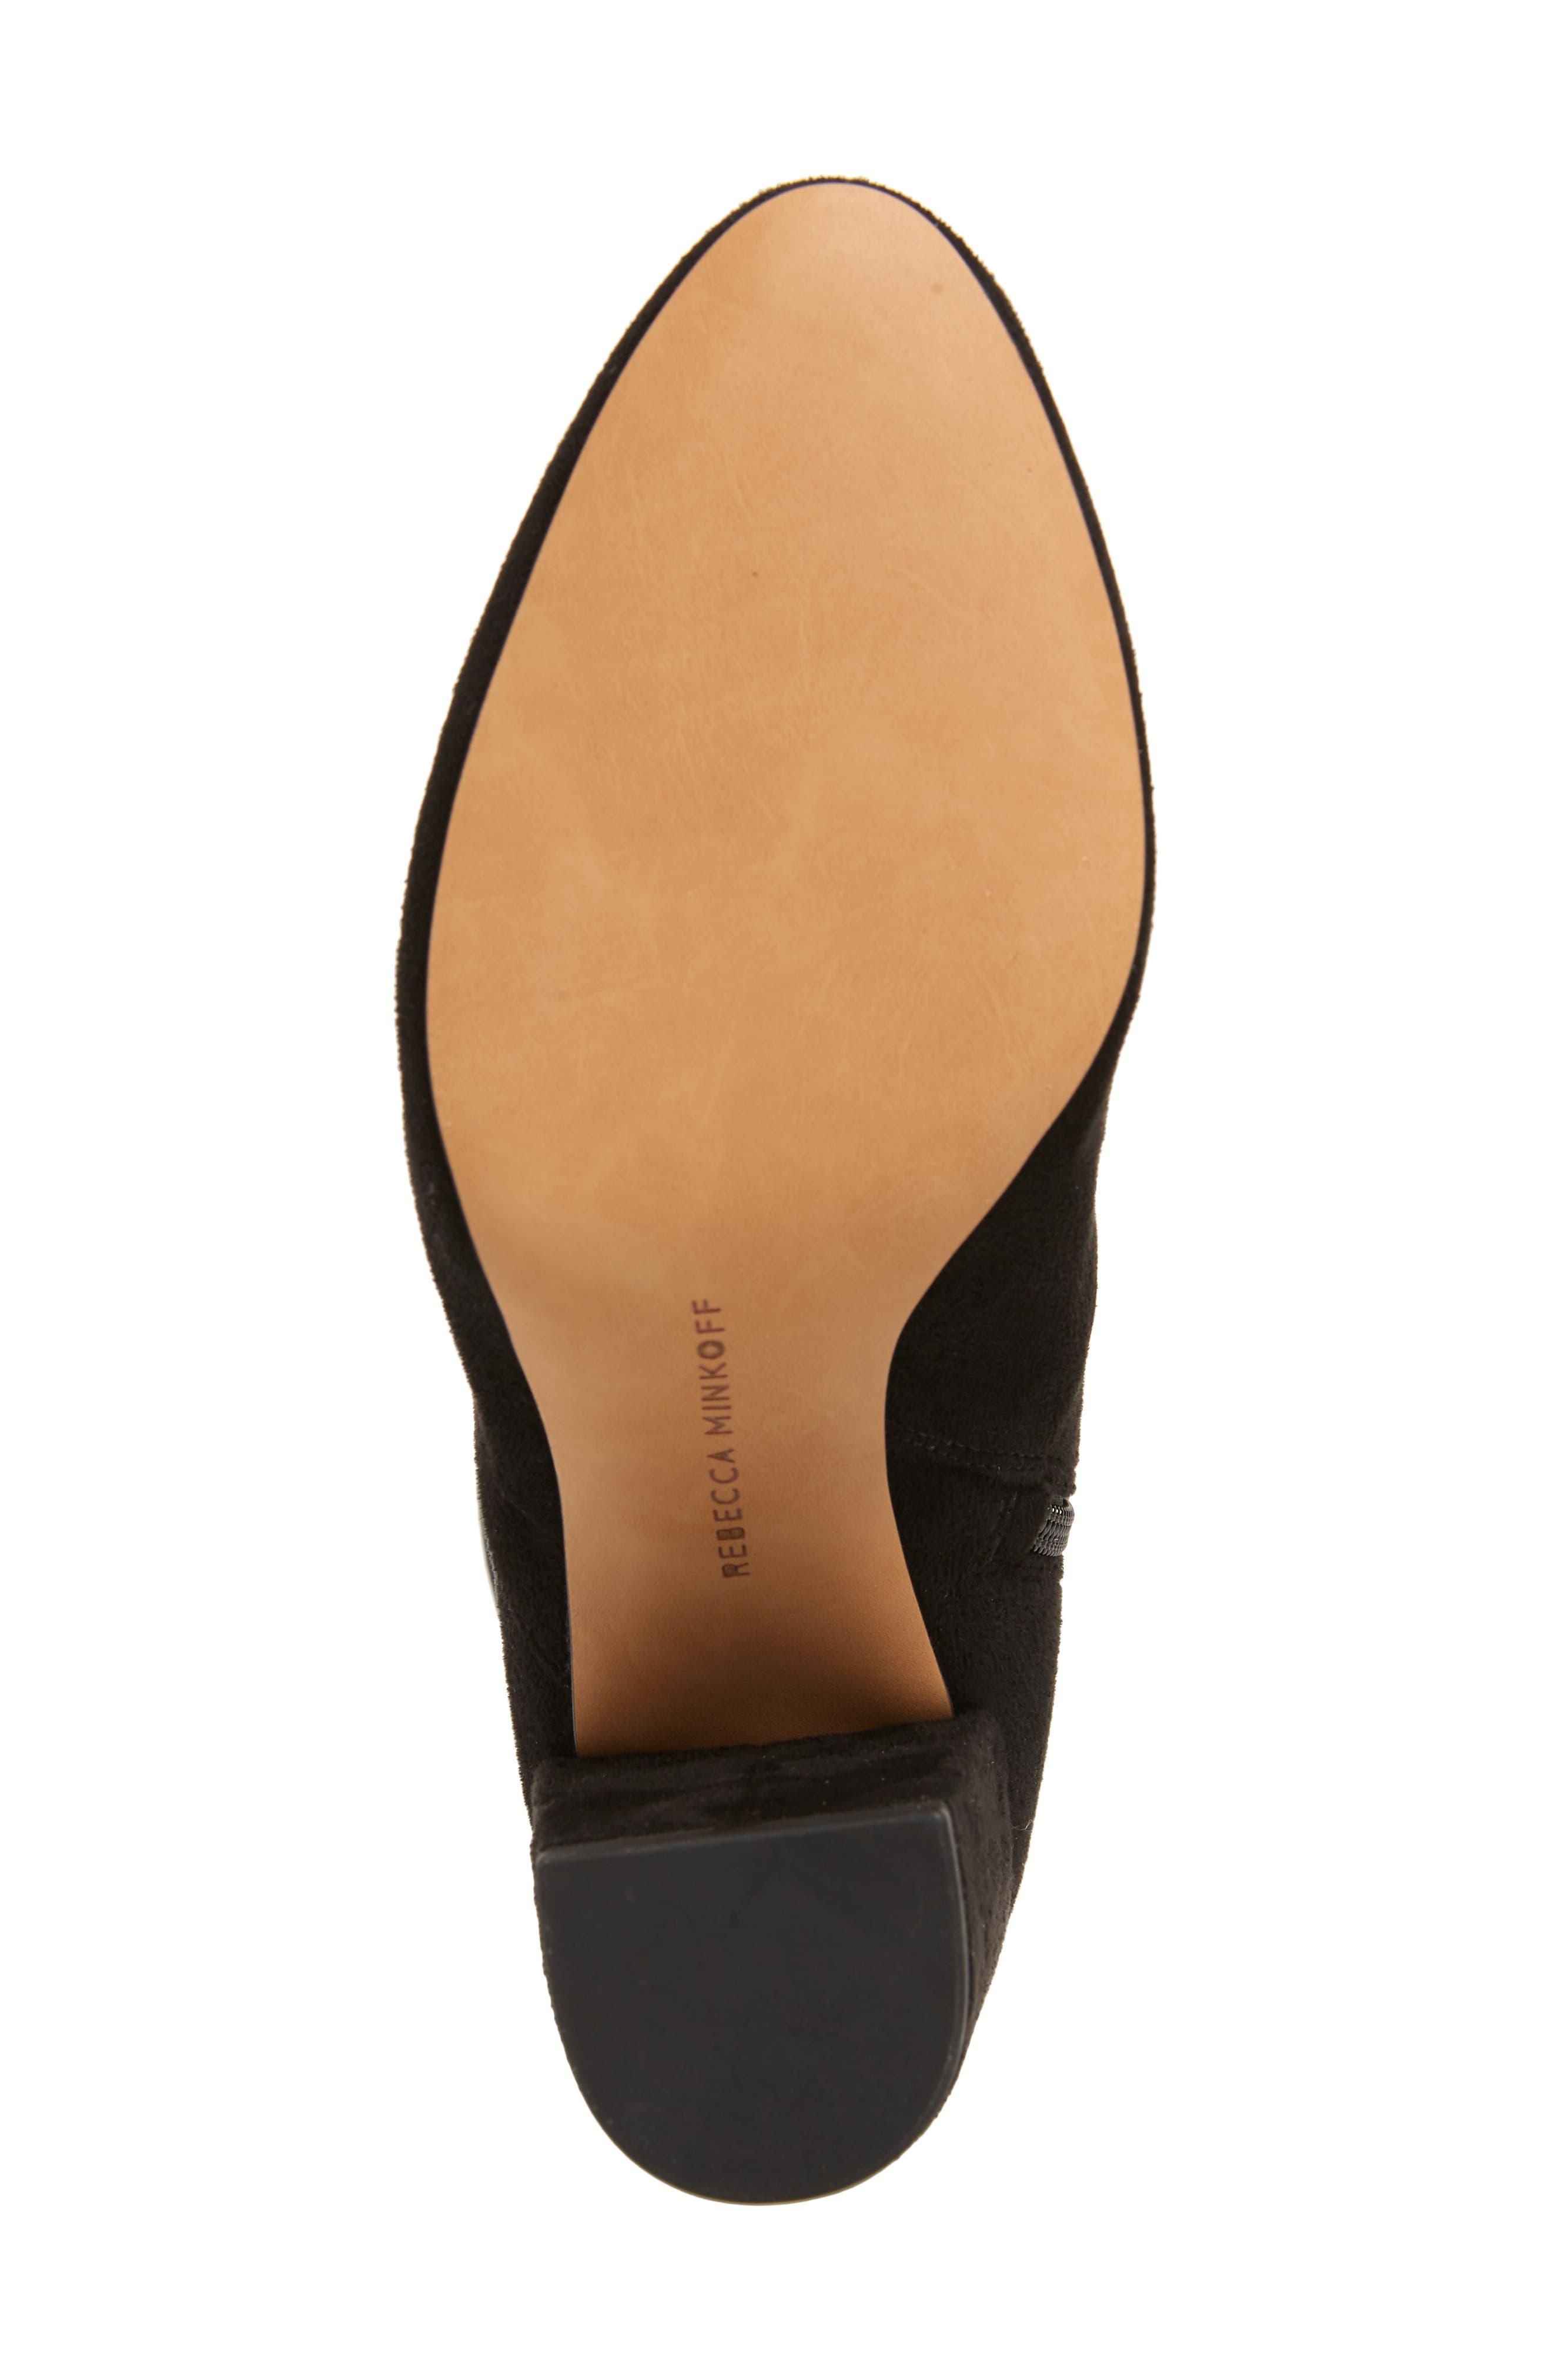 REBECCA MINKOFF, Gillian Knee High Boot, Alternate thumbnail 6, color, 001